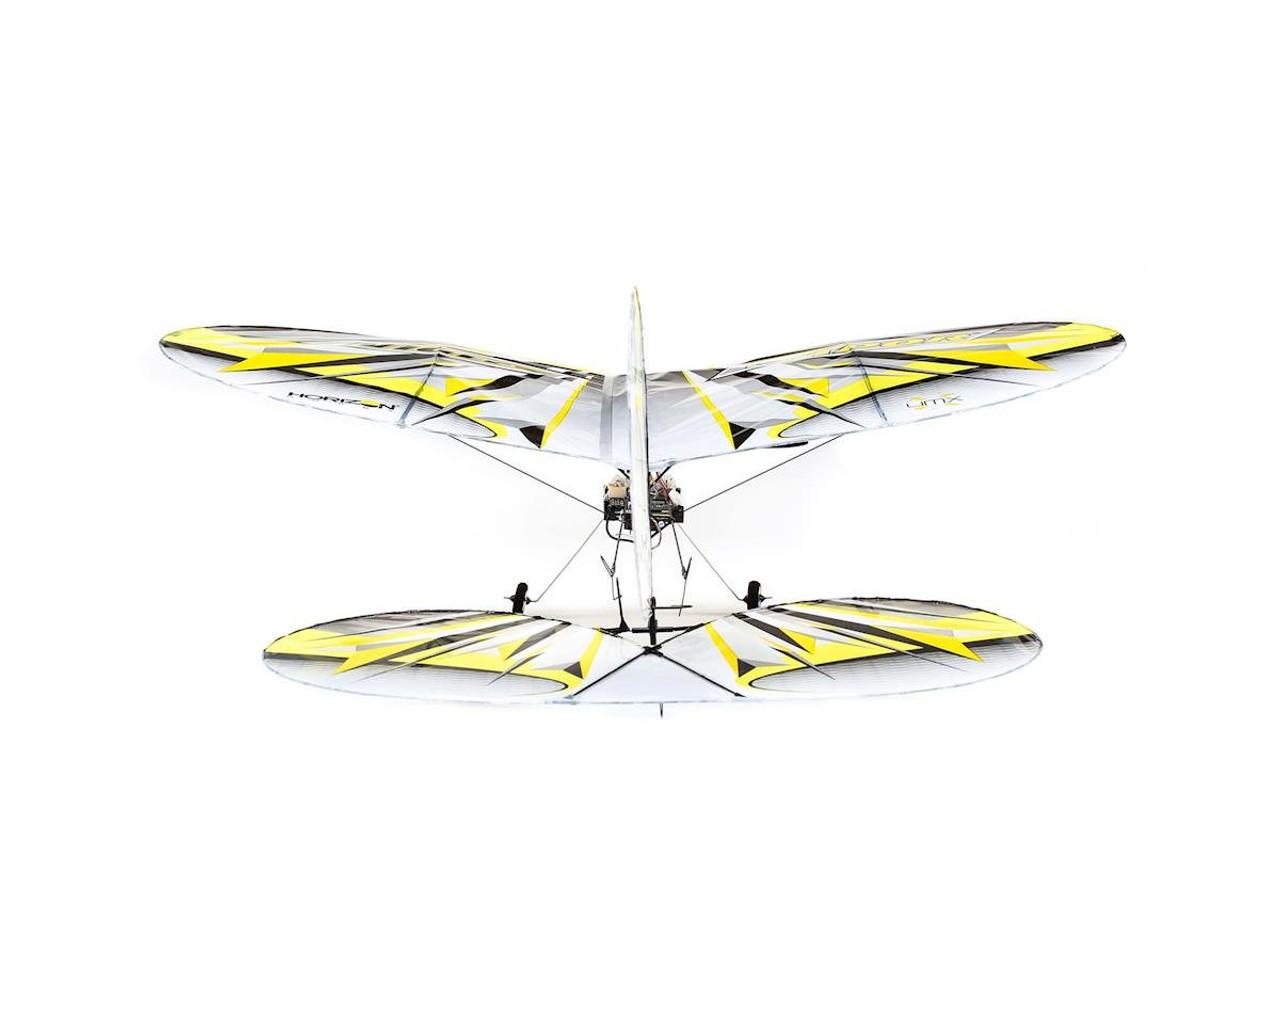 E-flite UMX Night Vapor Basic Bind-N-Fly Electric Airplane (376mm) w/AS3X & SAFE